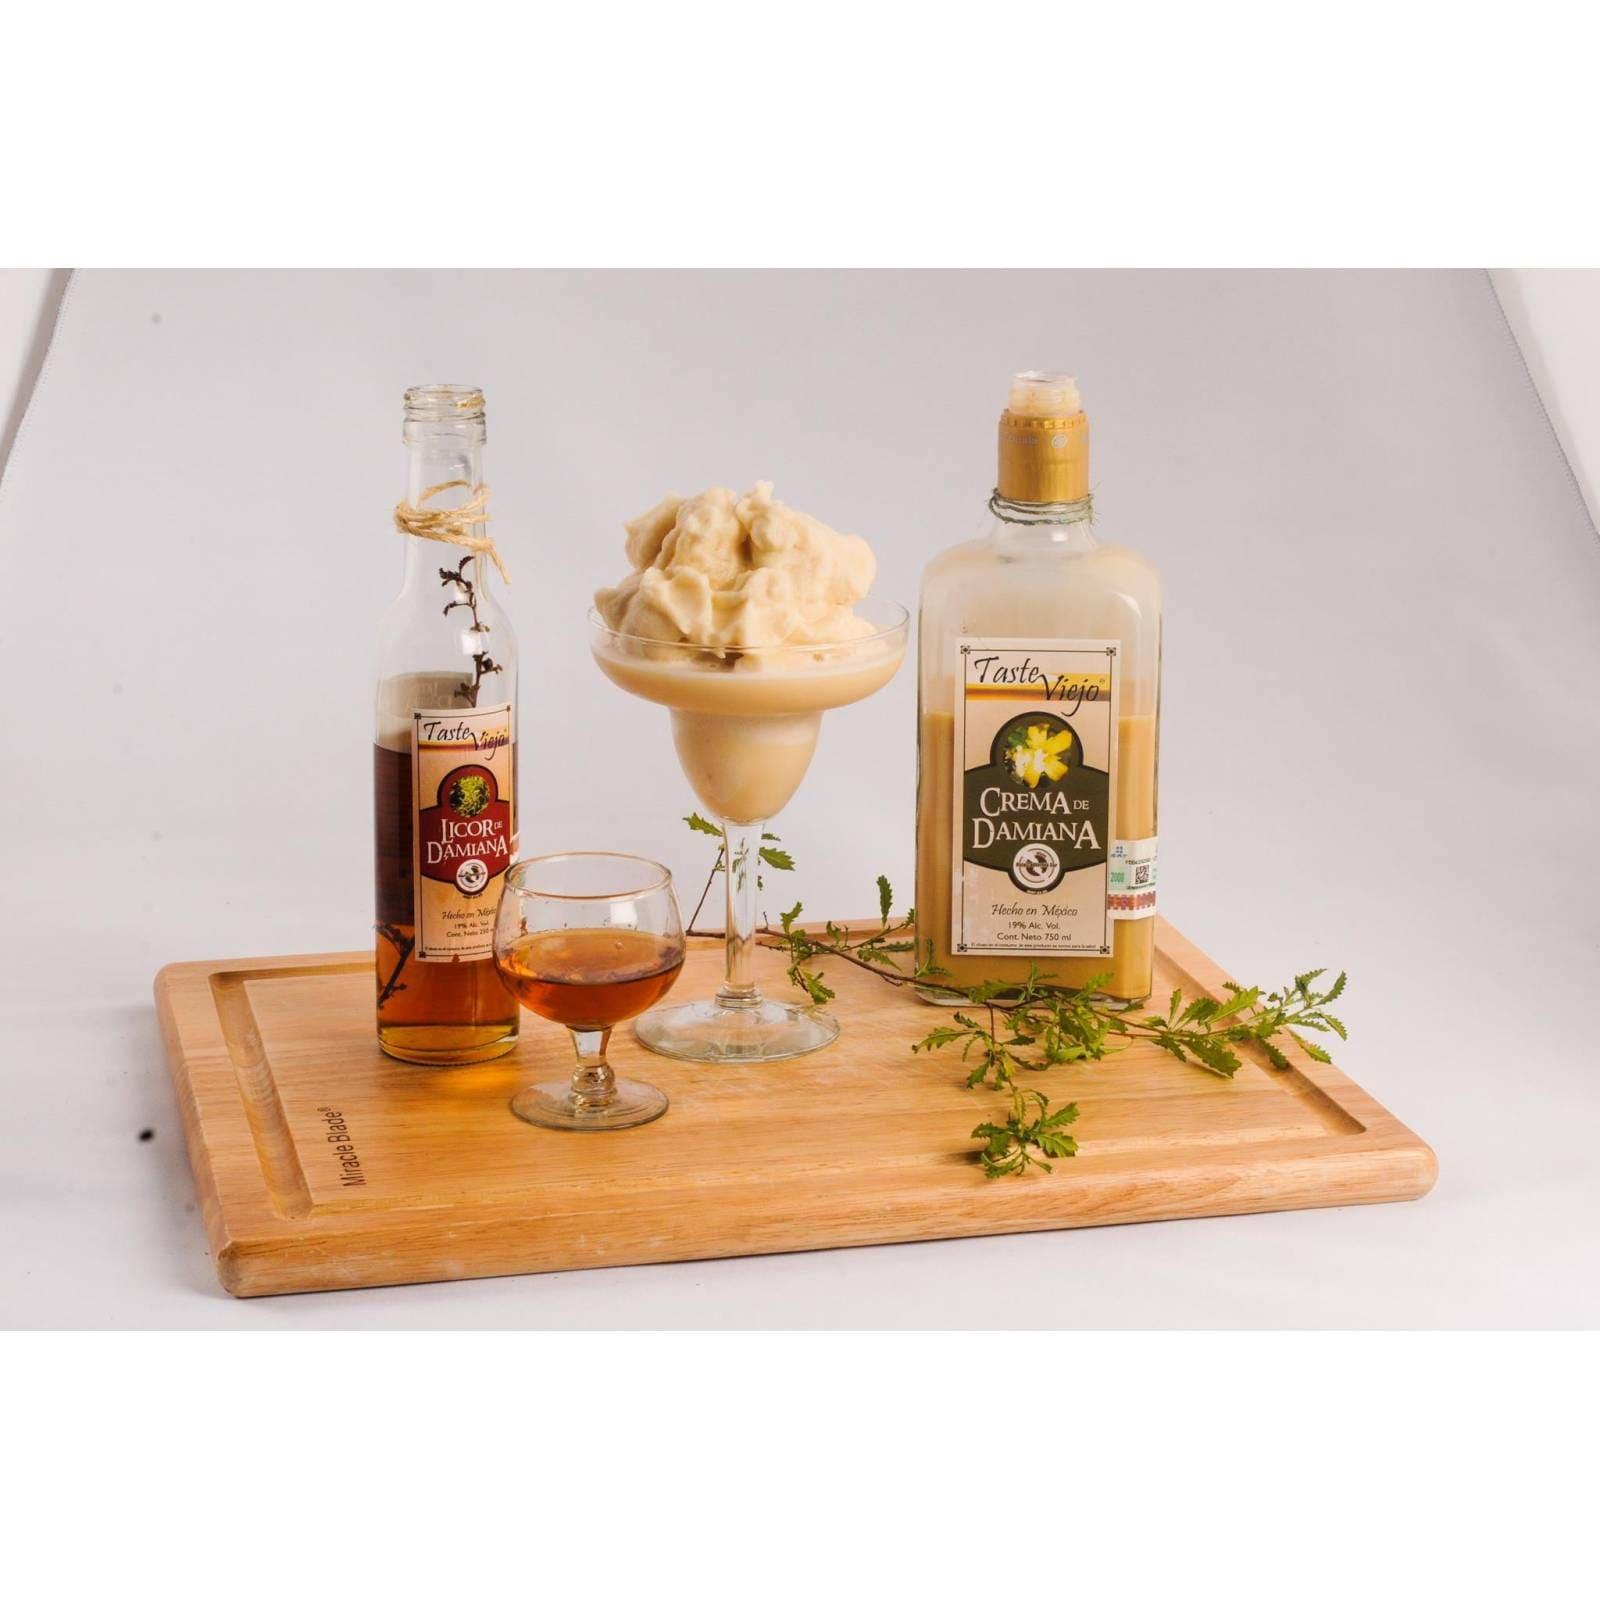 Crema De Damiana Artesanal Gourmet De Baja California Sur 750 ml